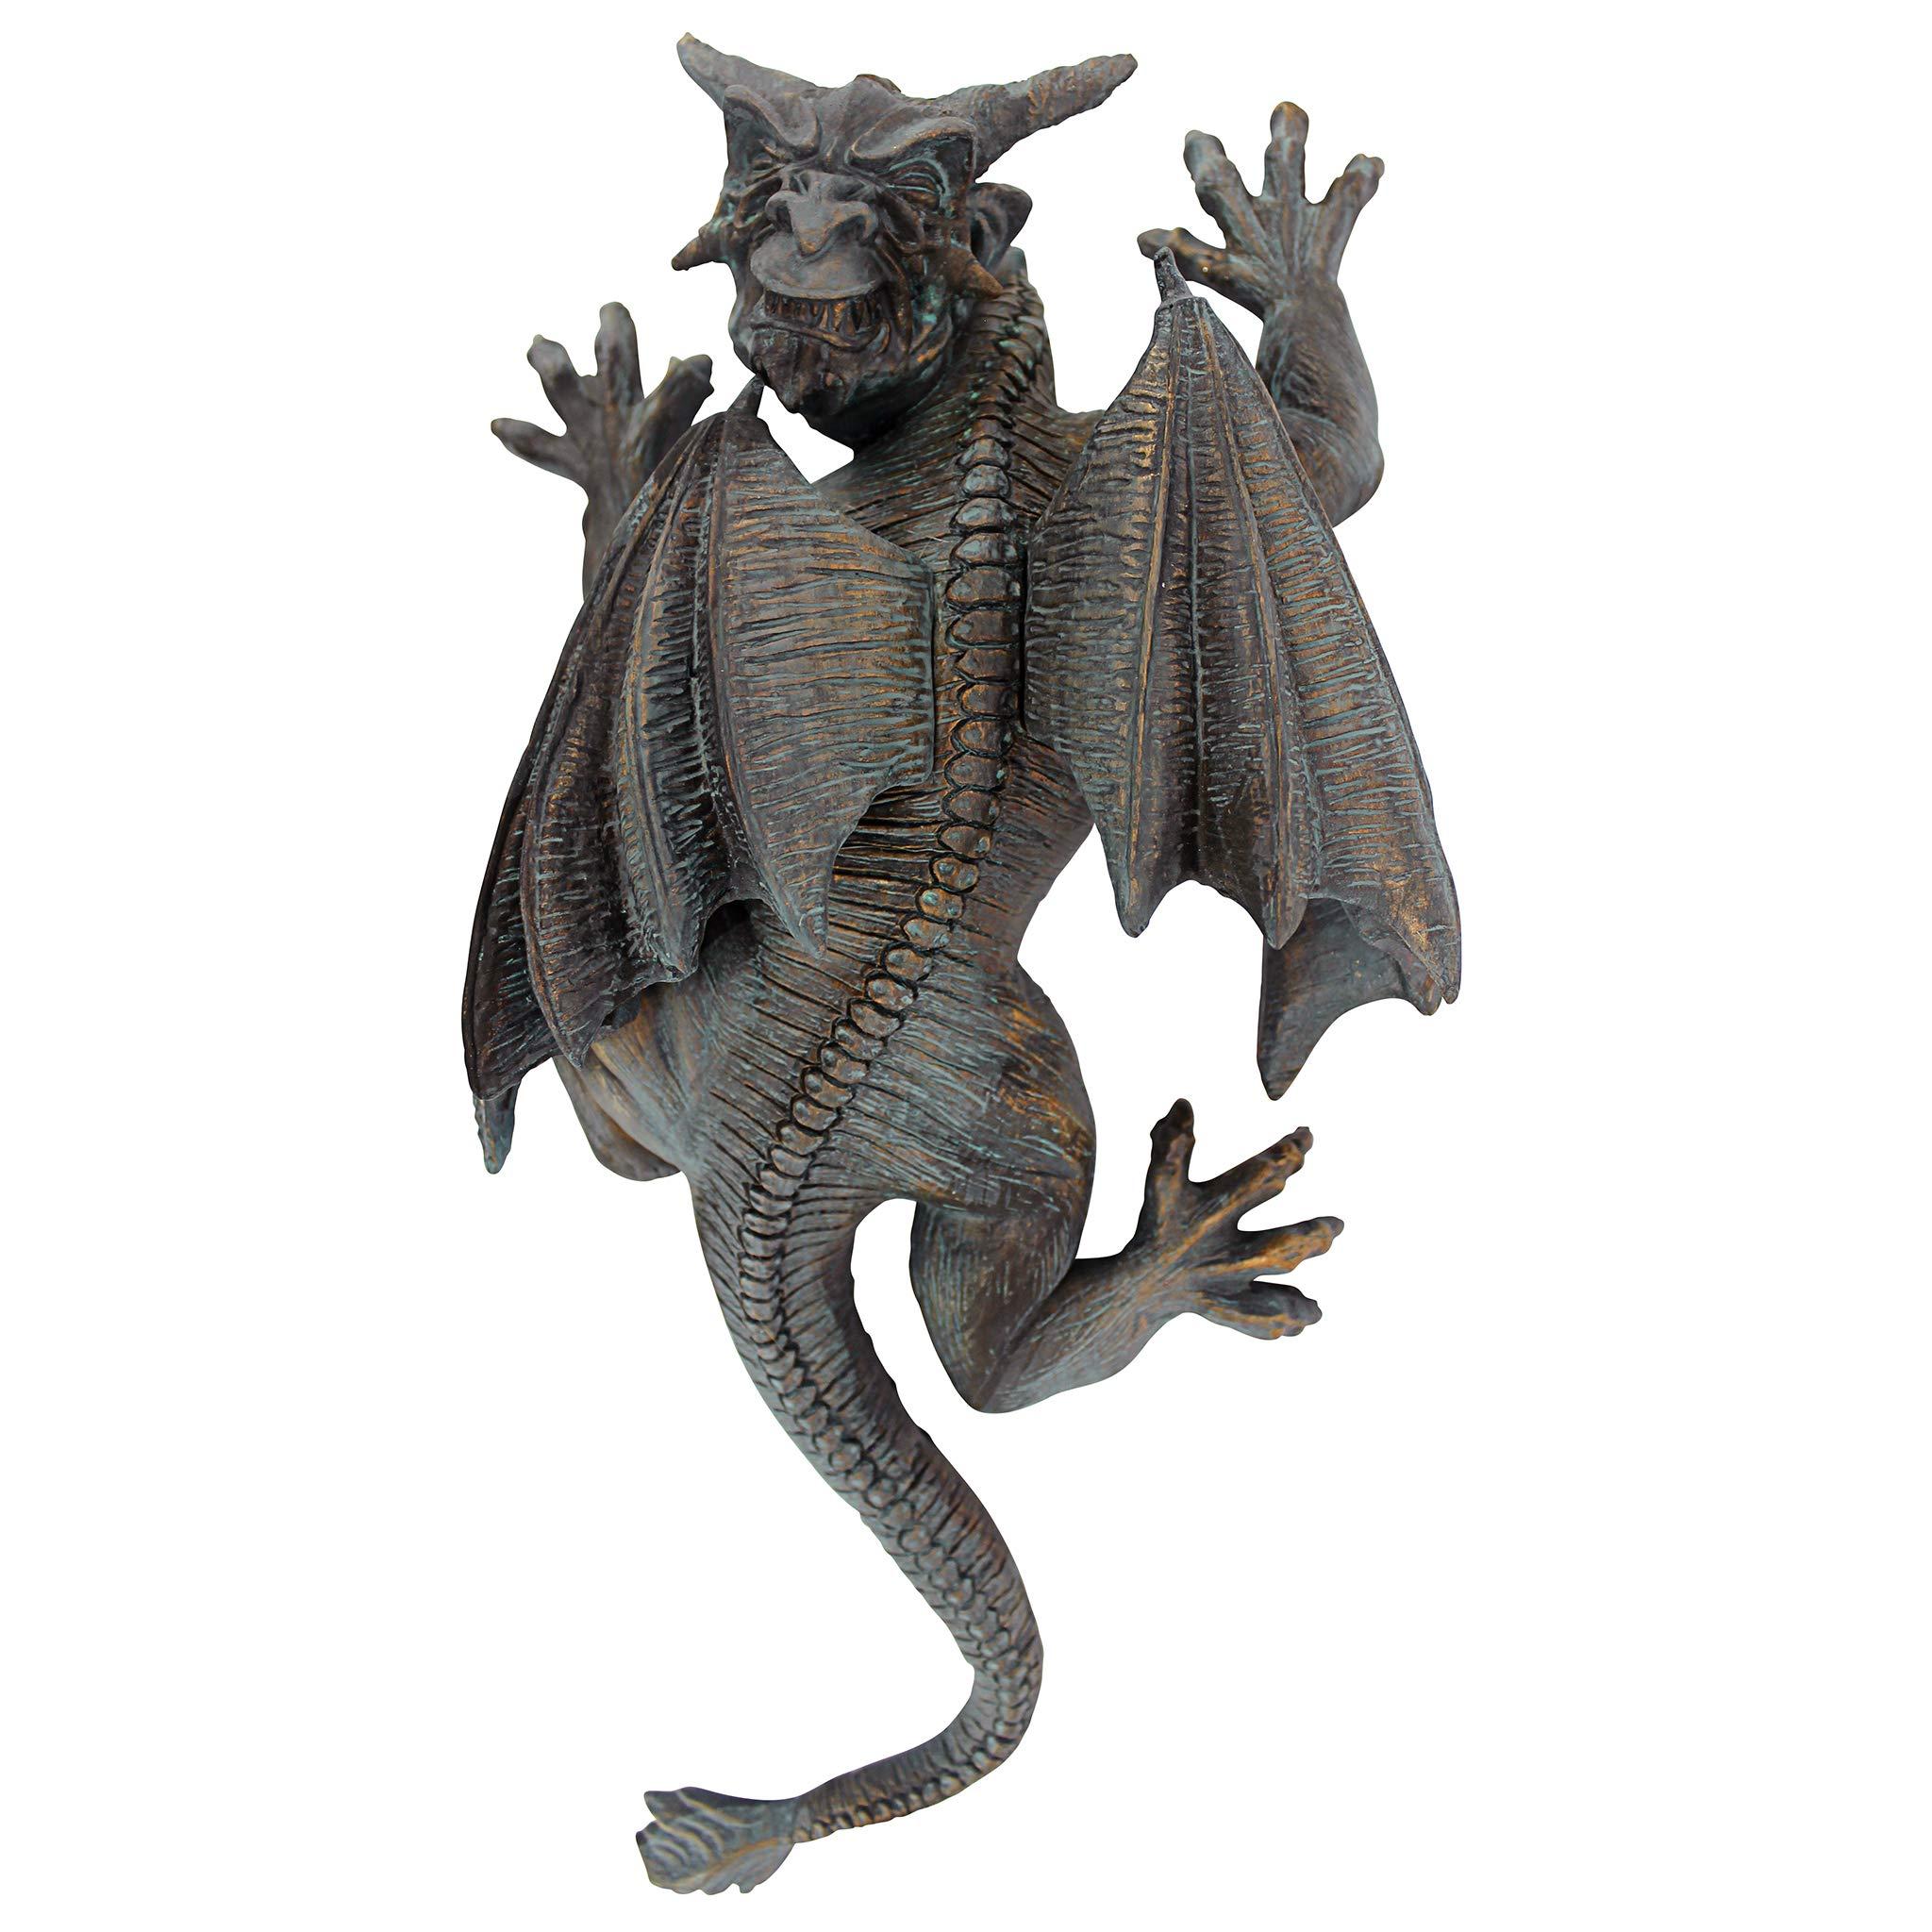 Design Toscano Gargoyle Demon on the Loose Gothic Decor Wall Sculpture, Medium, 13 Inch, Polyresin, Bronze Verdigris Finish by Design Toscano